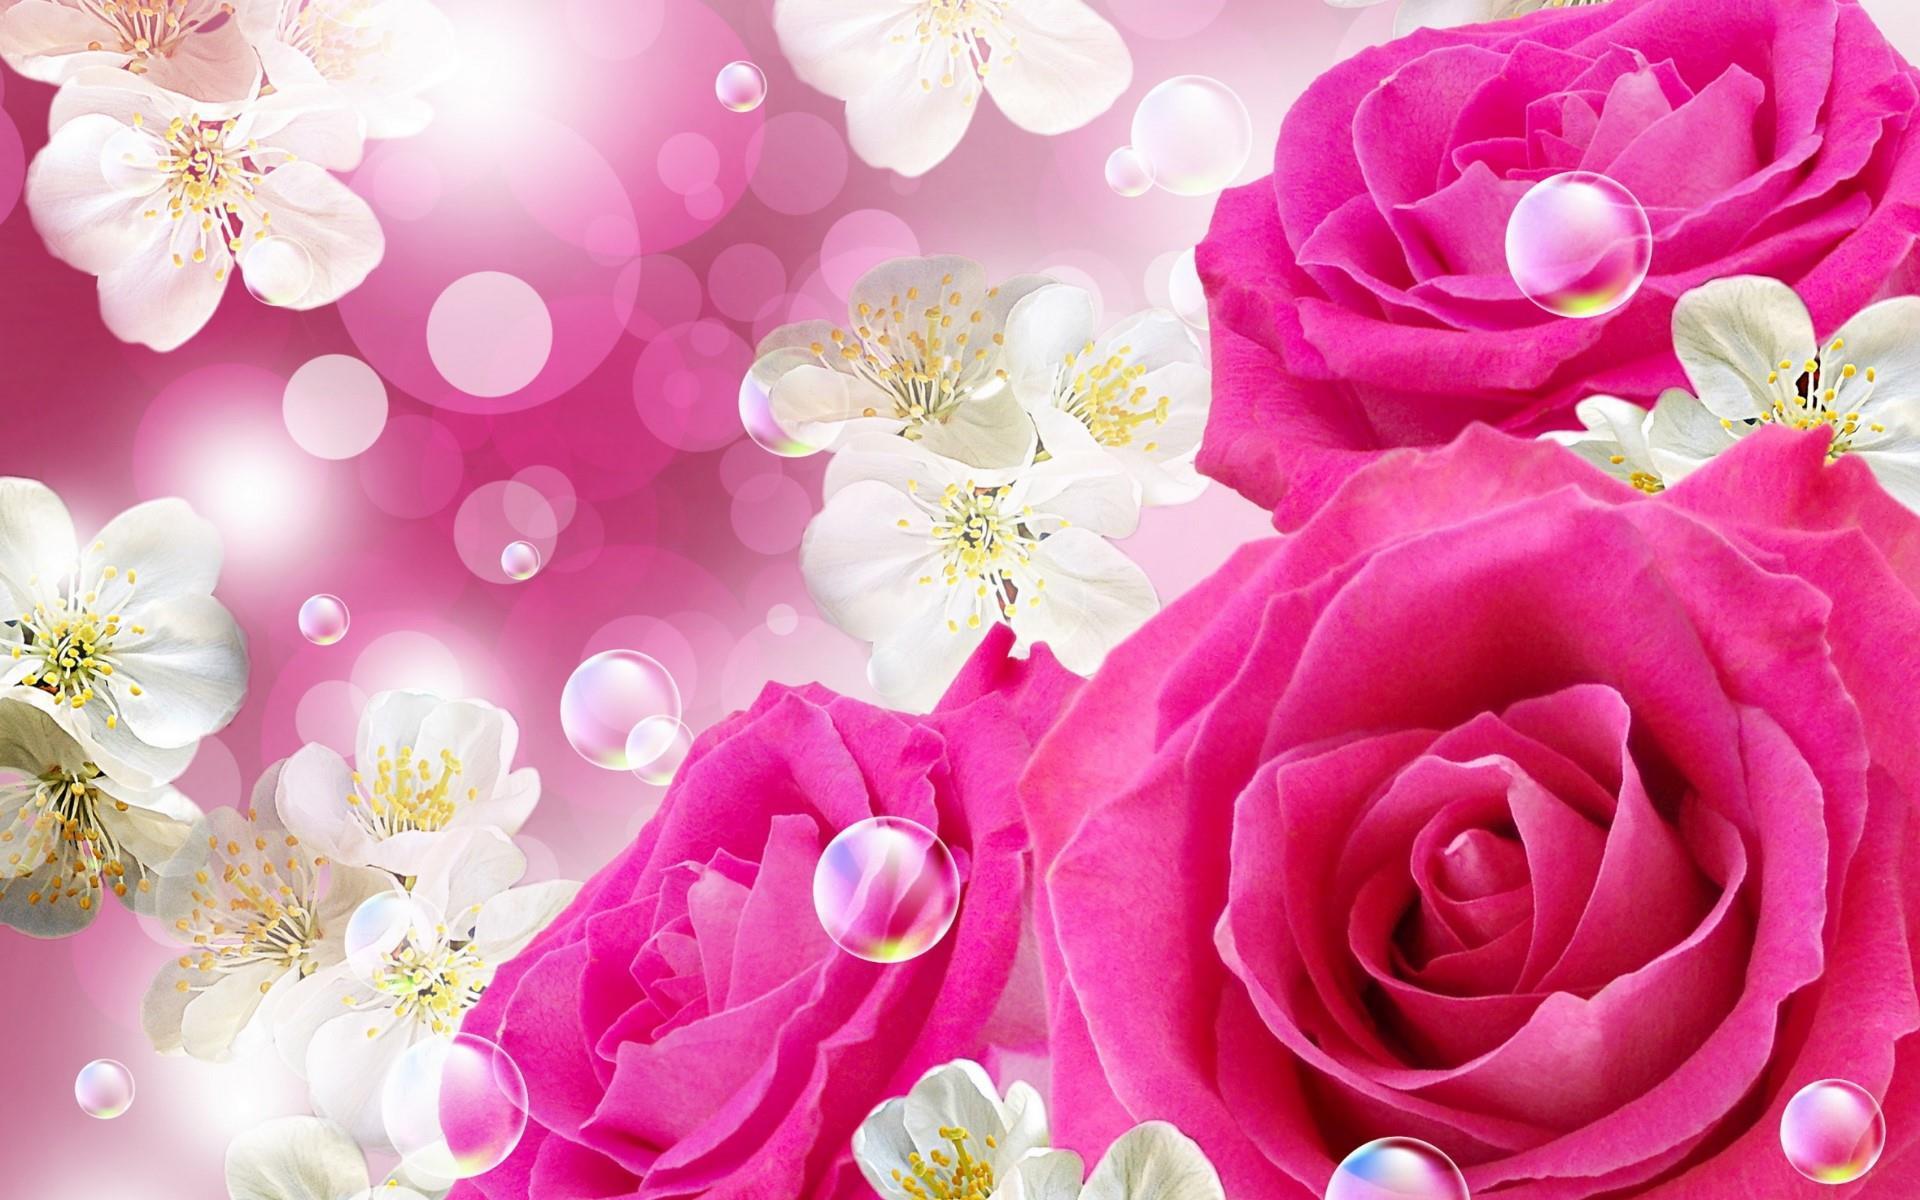 Fonds D'écran Nature: Les Fleurs Arrivent En Grand Format